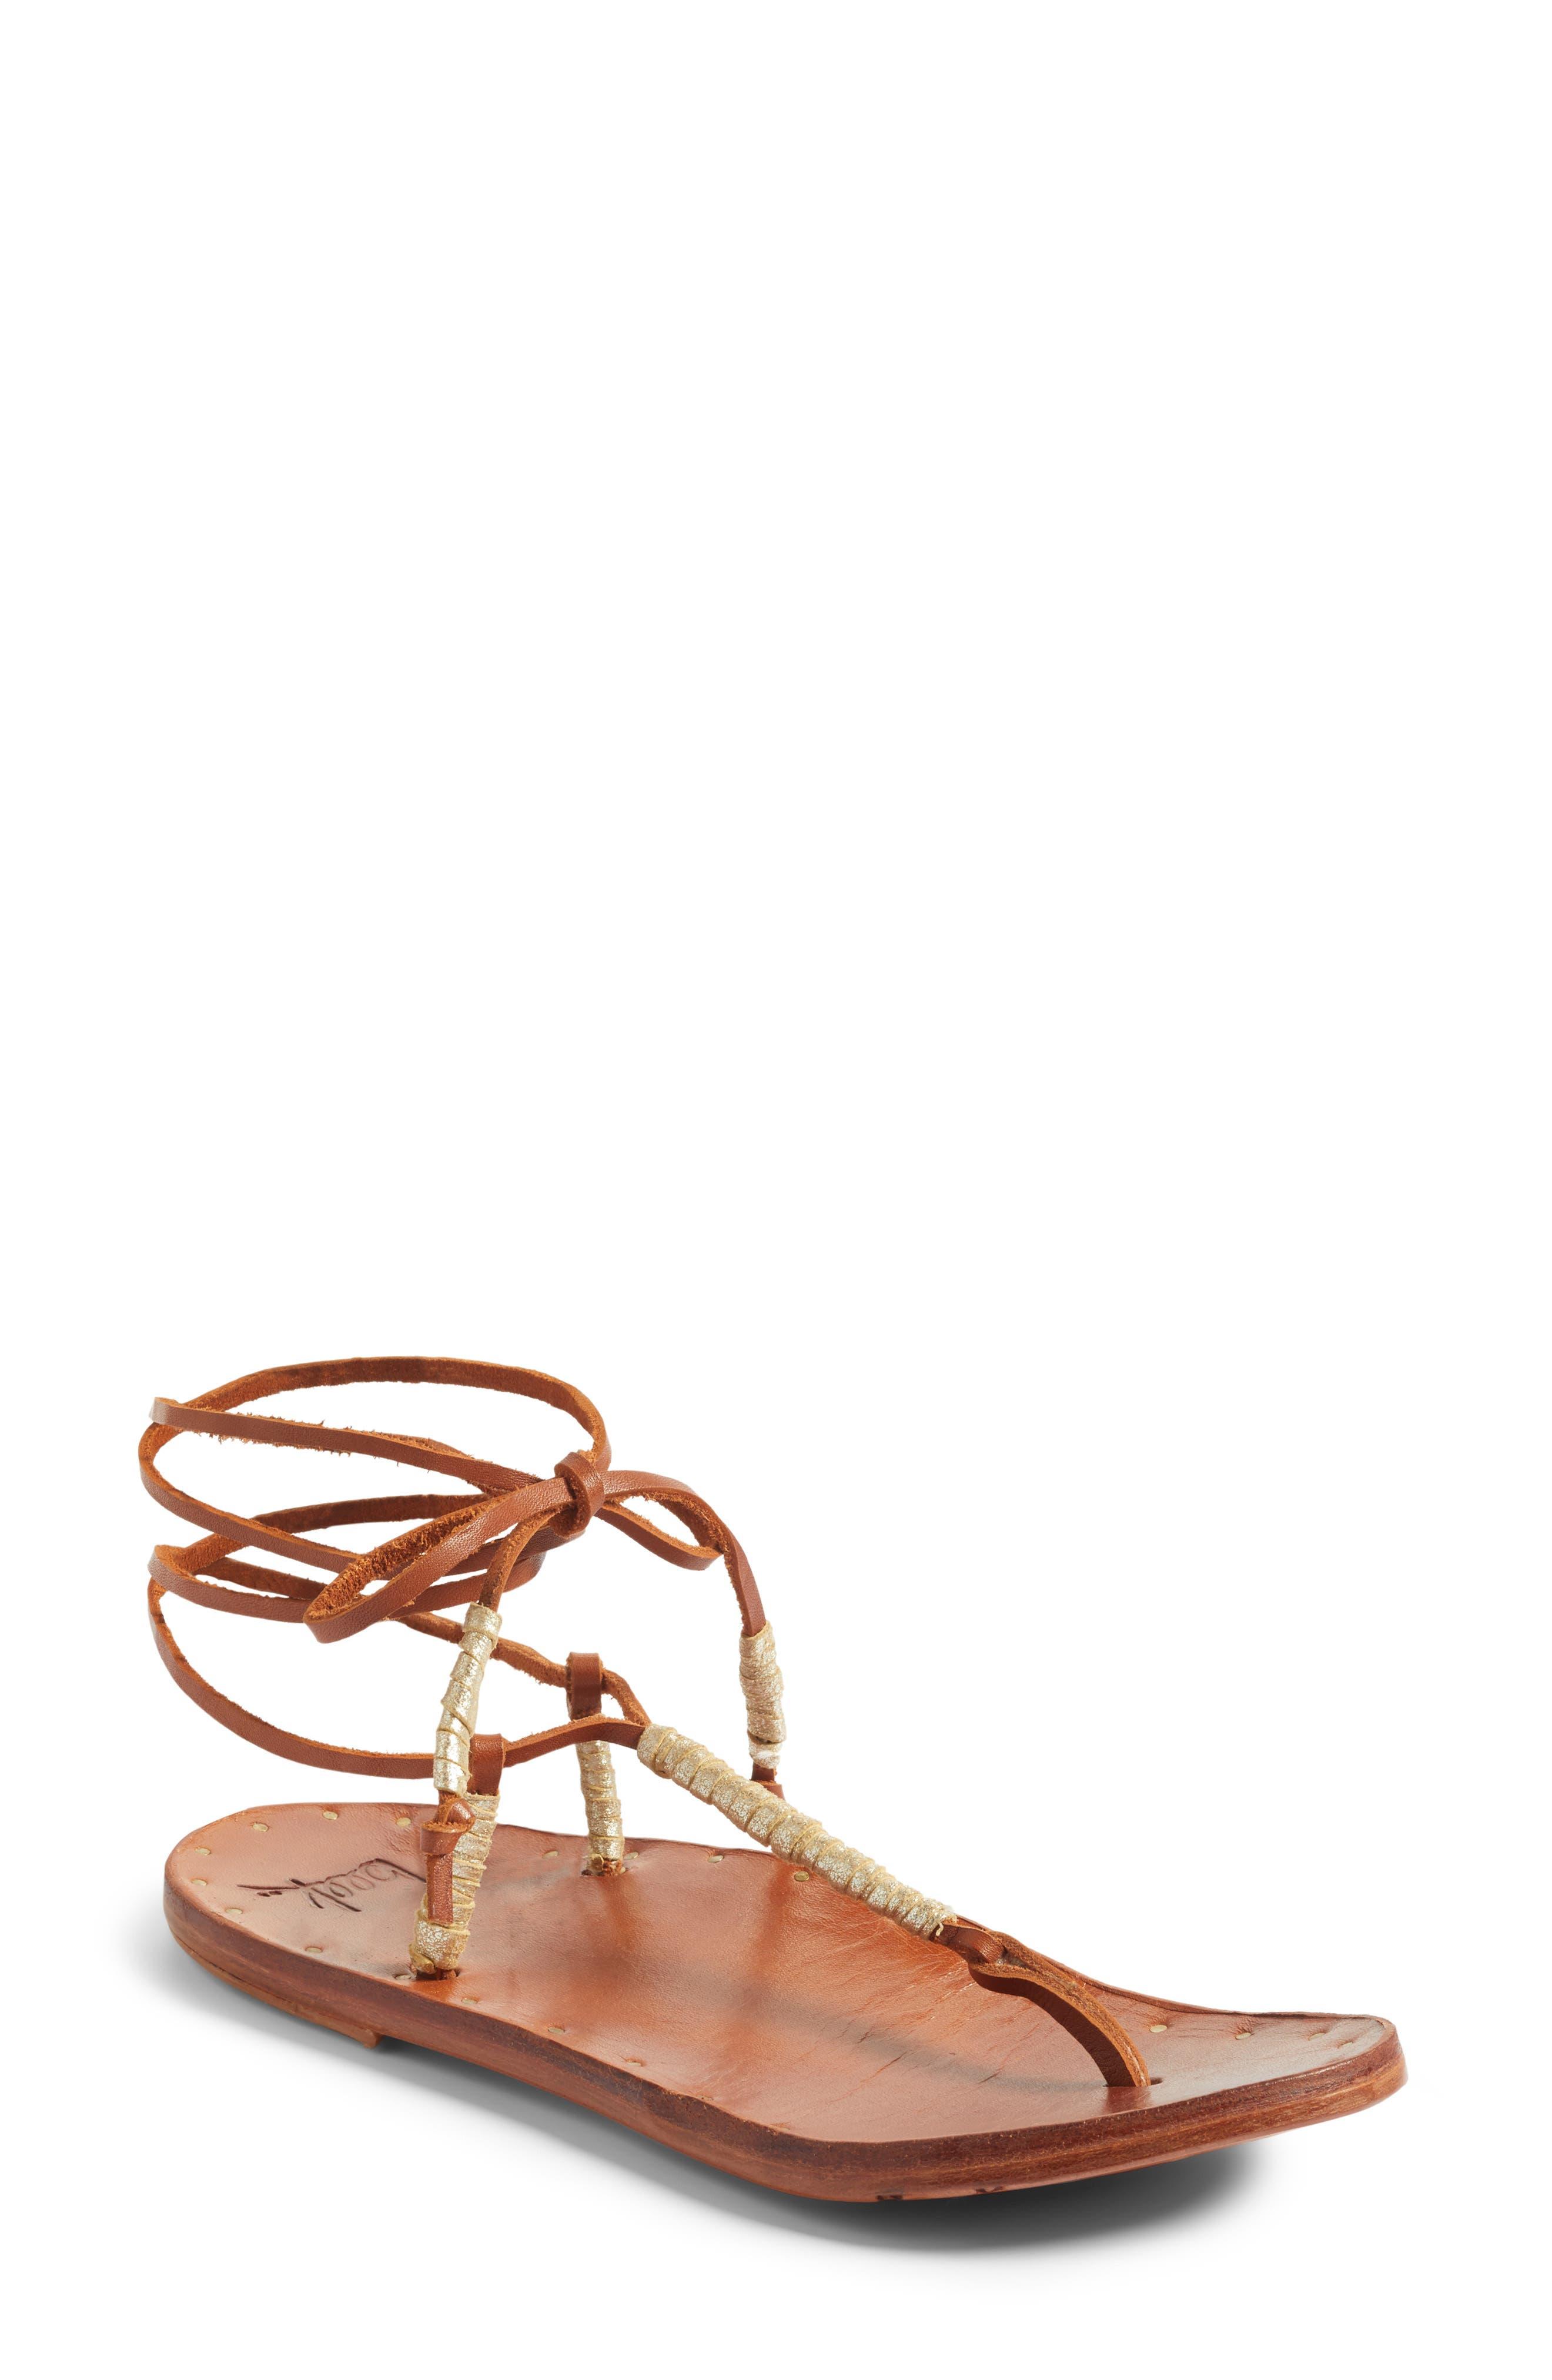 Alternate Image 1 Selected - Beek Crane Sandal (Women)